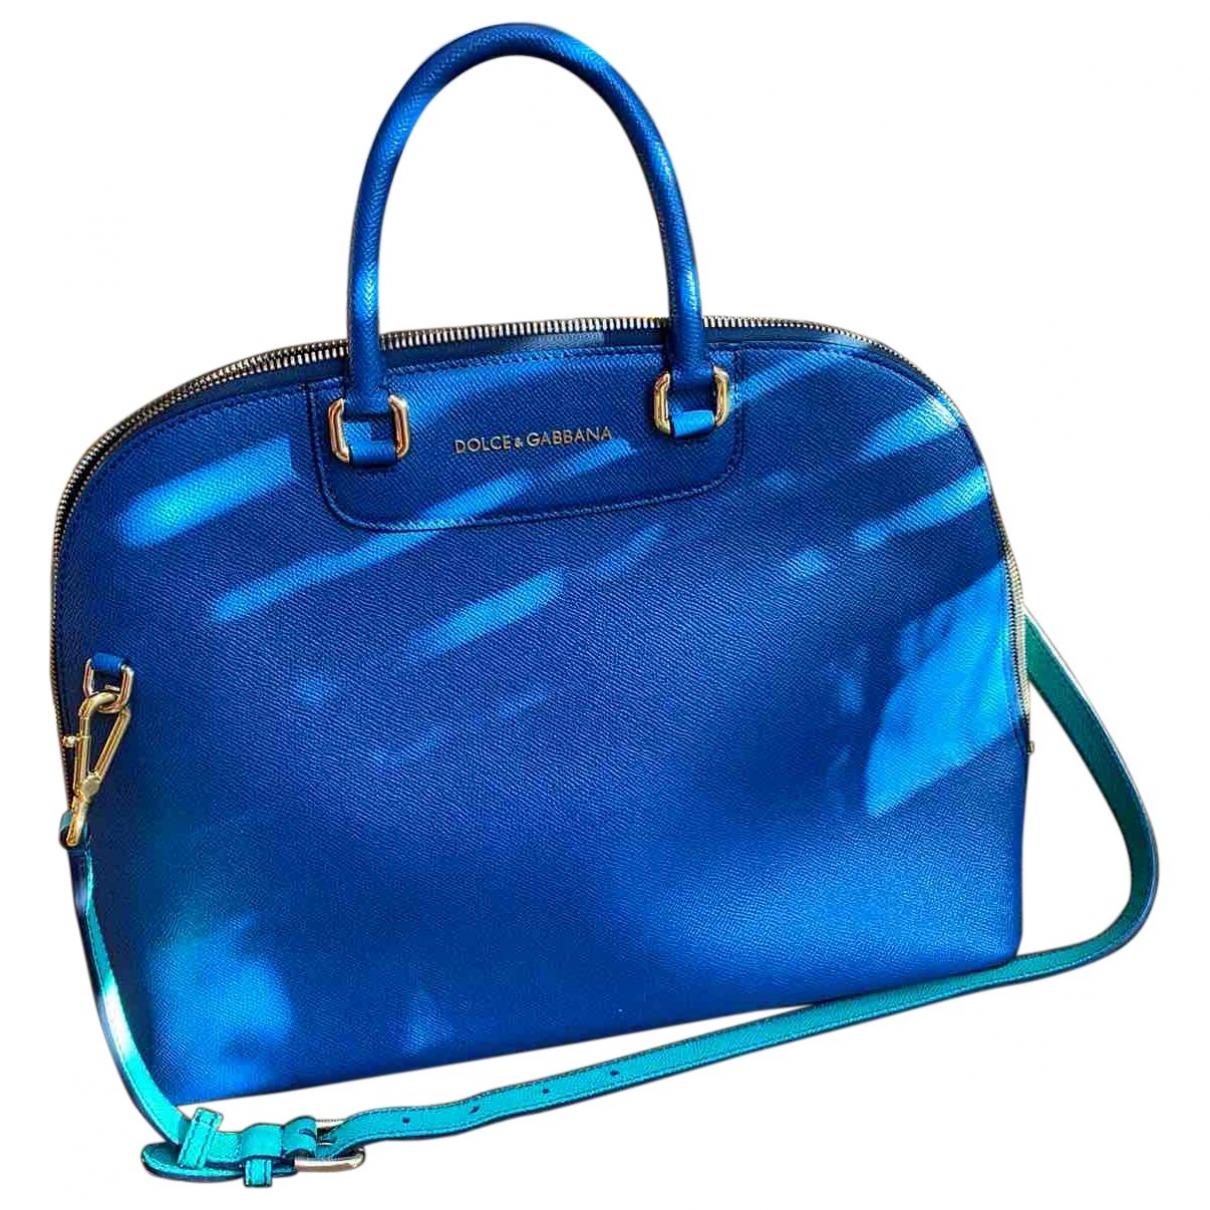 Dolce & Gabbana - Sac a main   pour femme en cuir - bleu